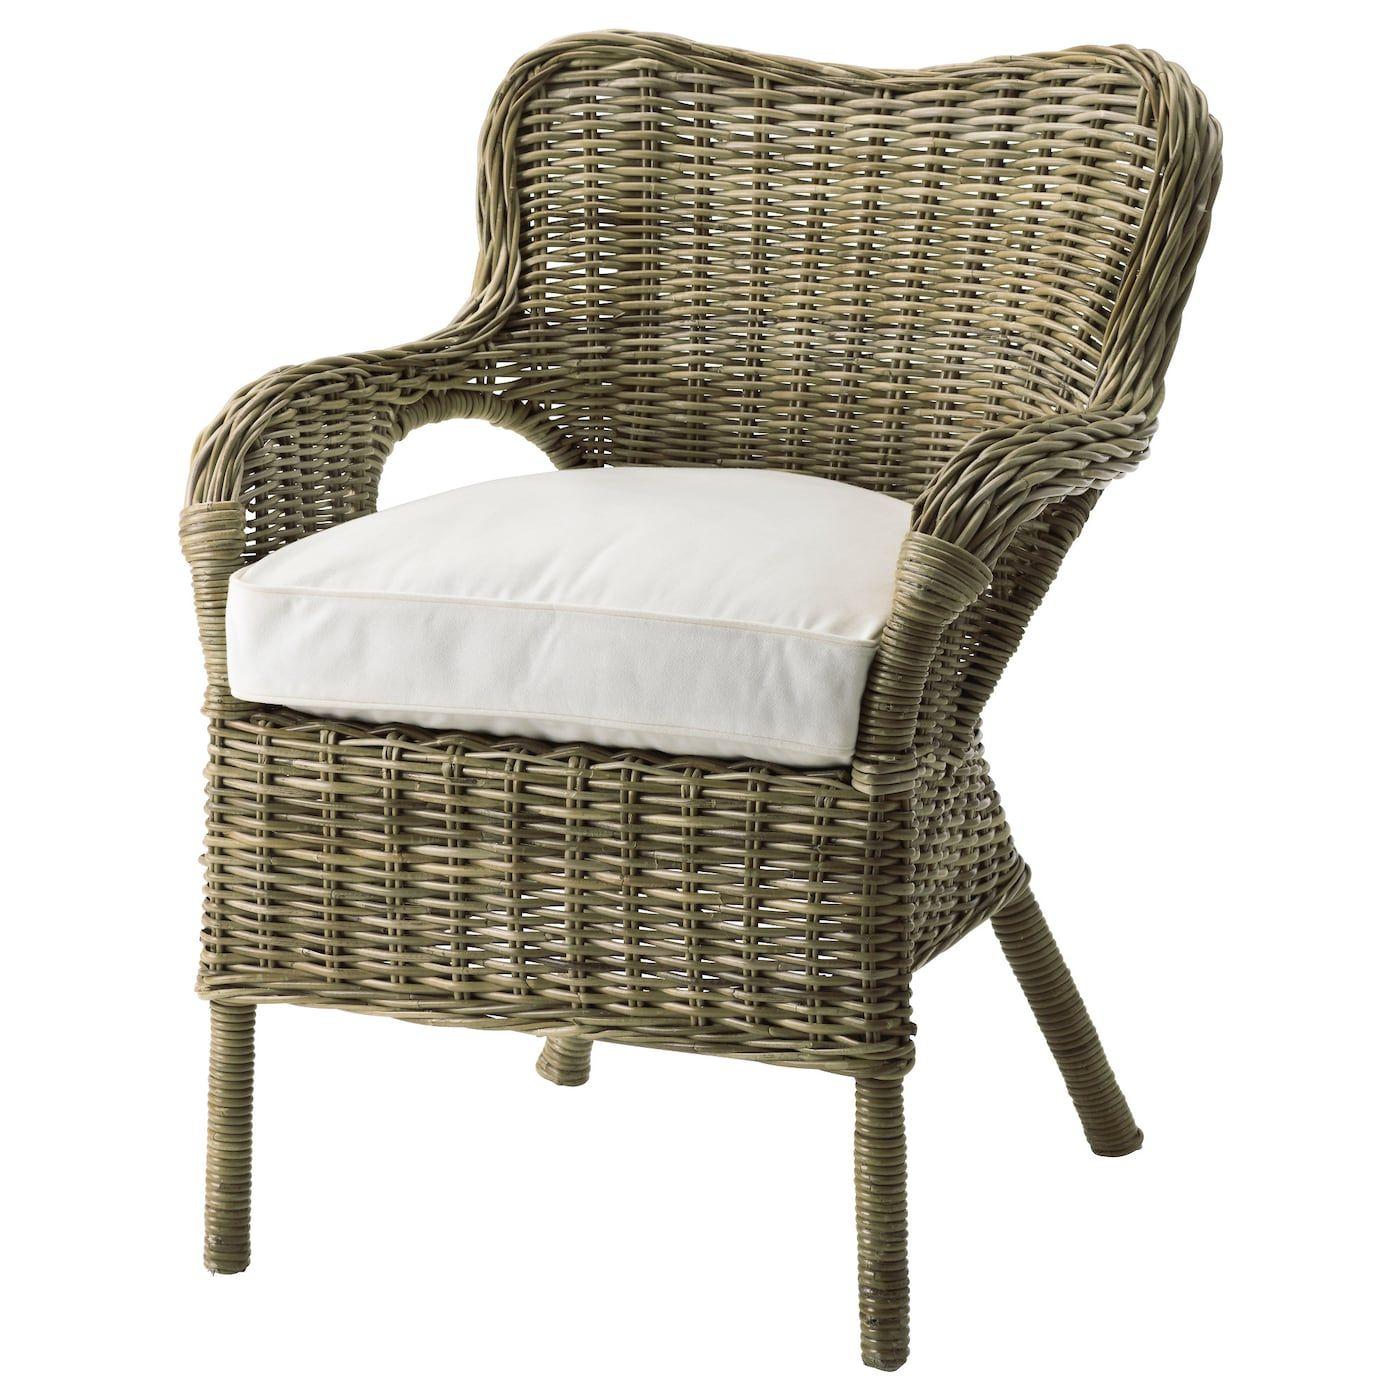 IKEA BYHOLMA Armchair gray, white Furniture, Rattan